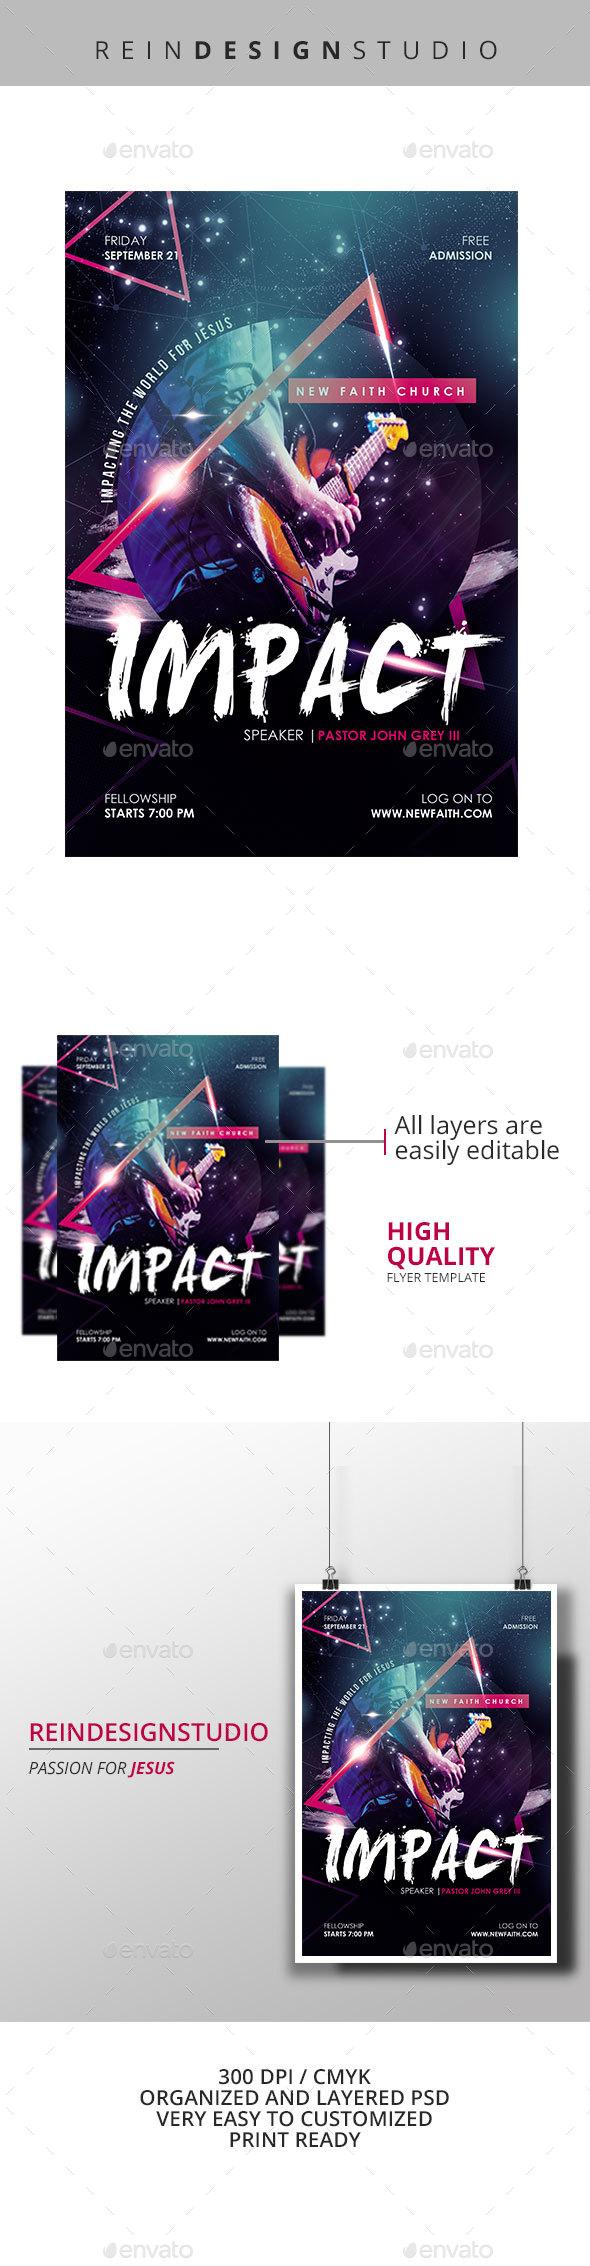 Impact Church Flyer - Church Flyers